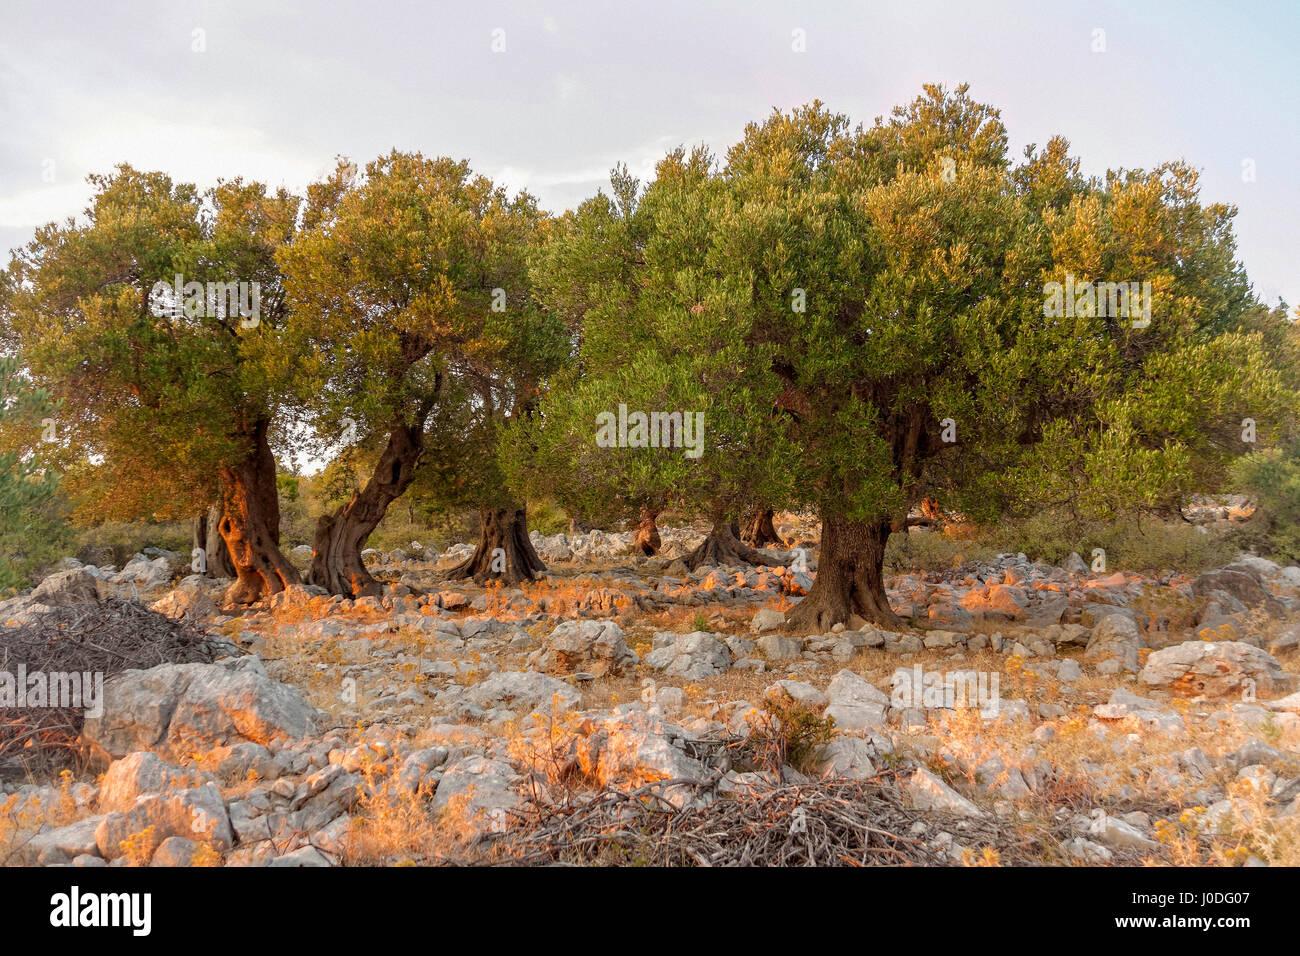 Olive Trees Croatia Stock Photos & Olive Trees Croatia Stock Images ...